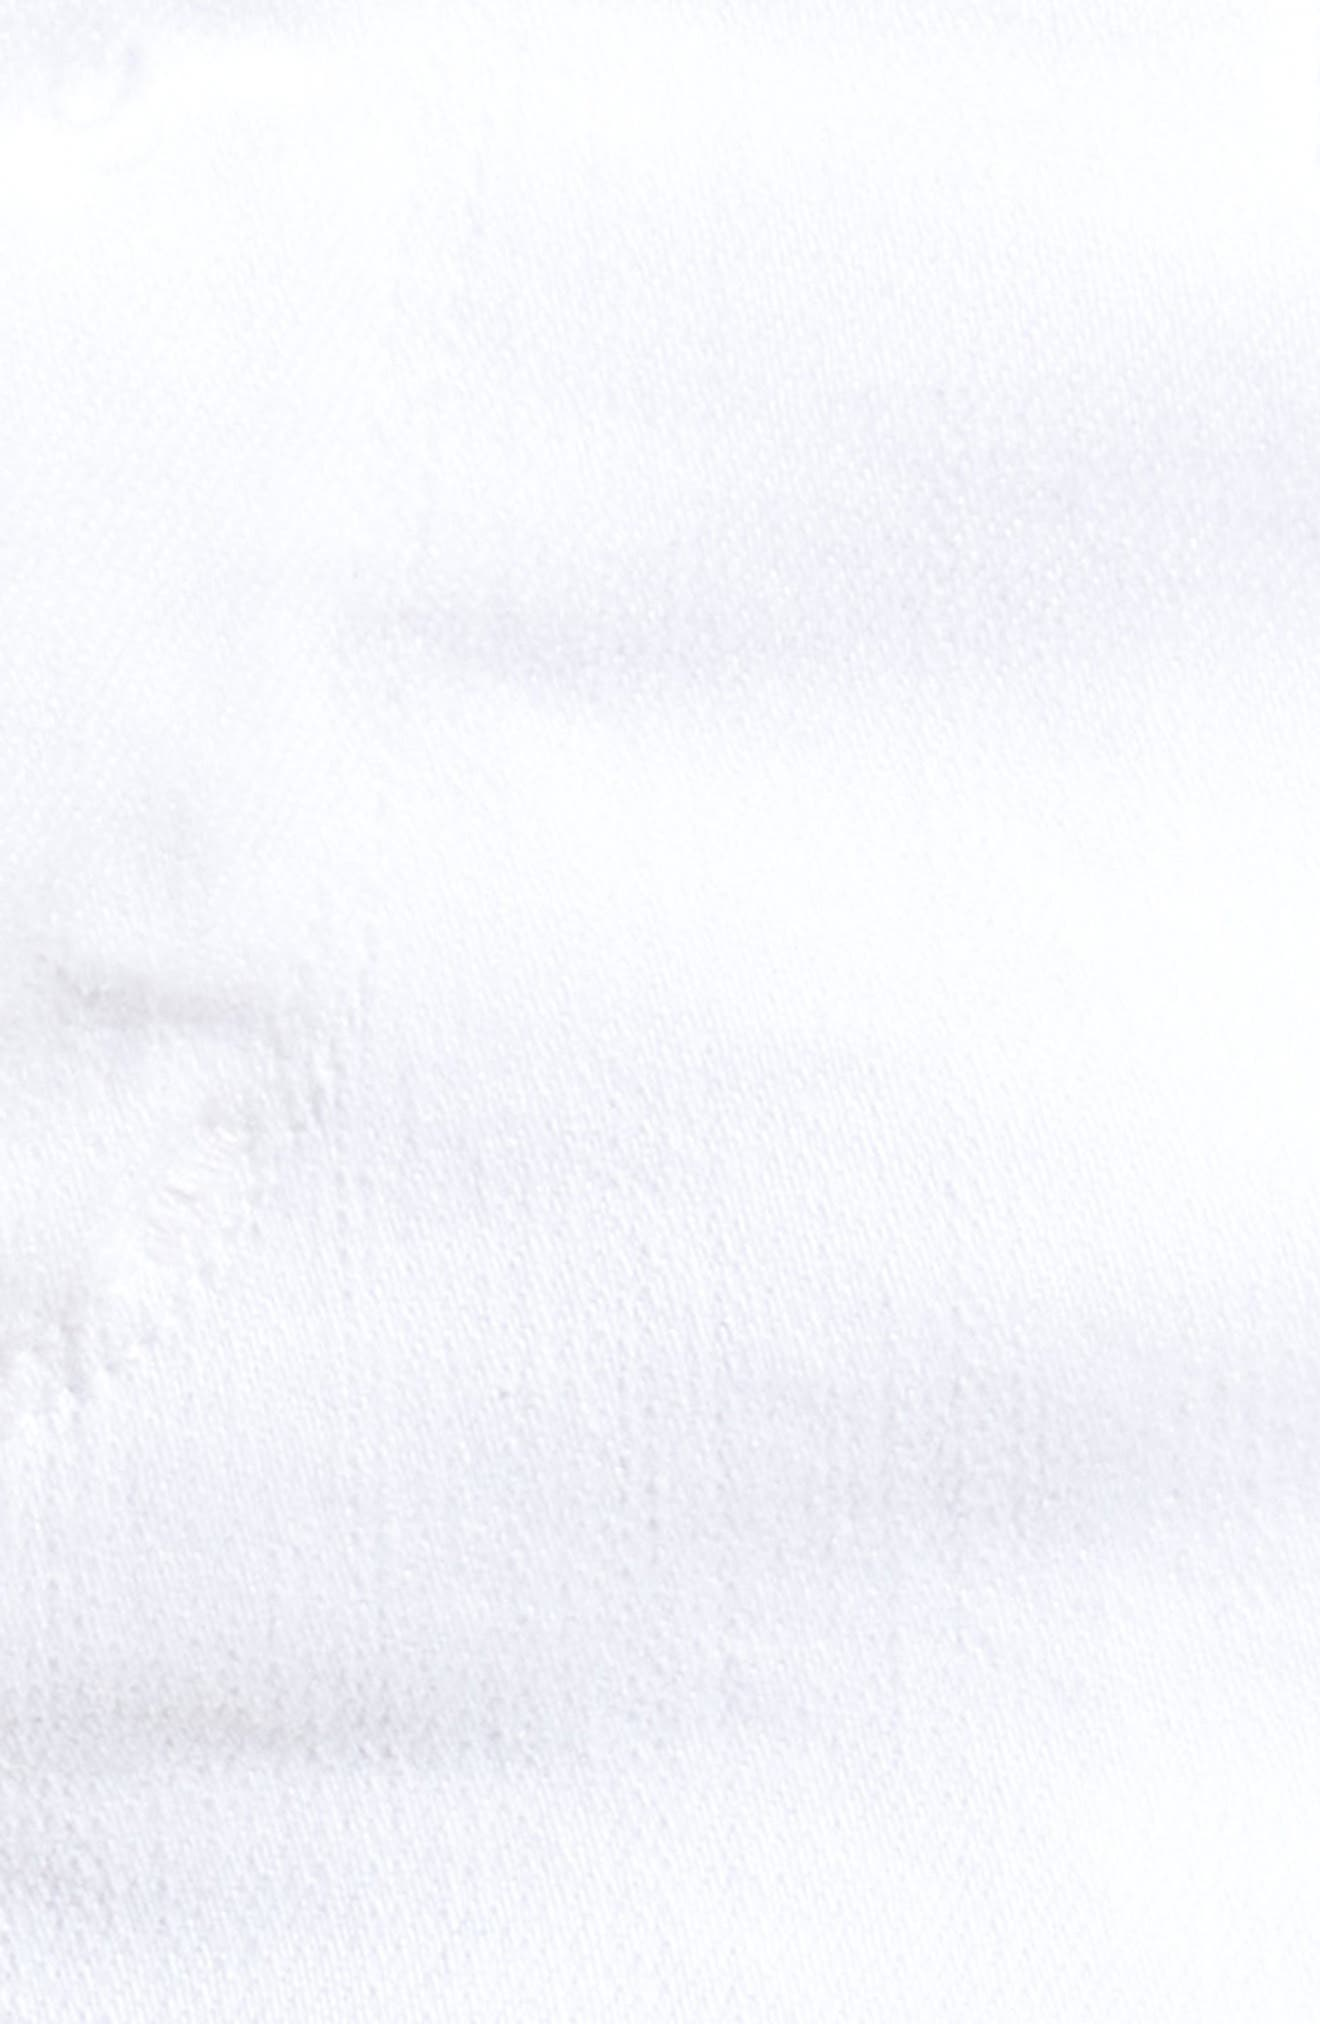 Ava Cutoff Denim Shorts,                             Alternate thumbnail 6, color,                             104